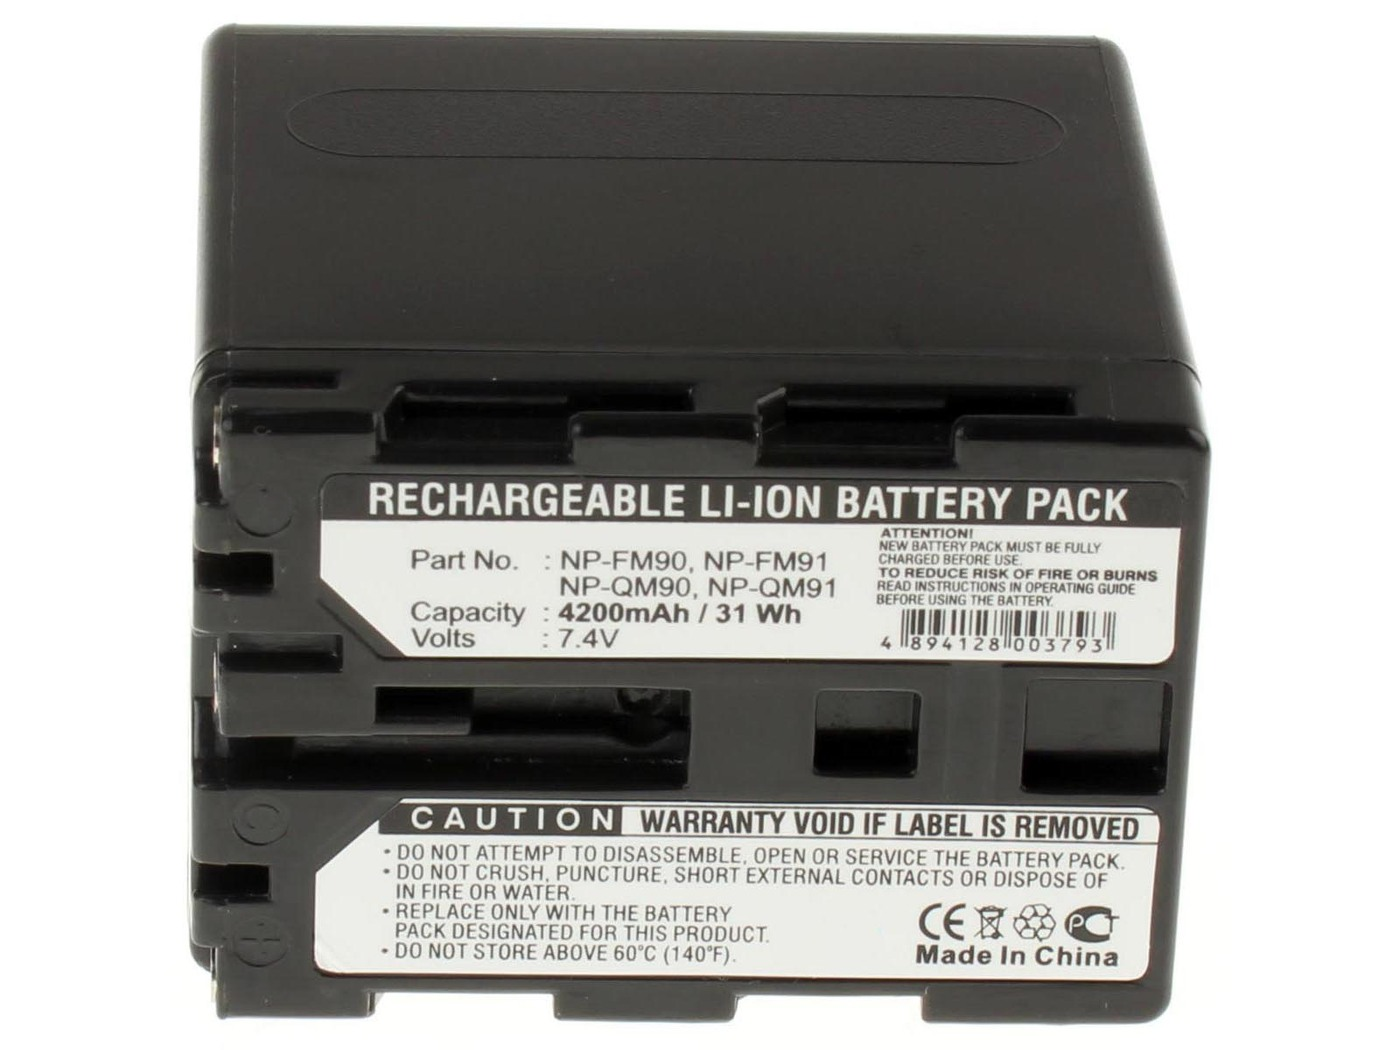 Аккумуляторная батарея iBatt iB-T1-F290 4200mAh для камер Sony HDR-HC1E, DCR-TRV270E, HVR-A1E, DCR-TRV285E, CCD-TRV218E, DCR-TRV22E, DCR-TRV250E, DCR-TRV255E, DCR-HC14E, DCR-HC15E, DCR-TRV19E, DCR-TRV33E, HVR-A1, CCD-TRV428E, DCR-TRV140E, DCR-TRV460E